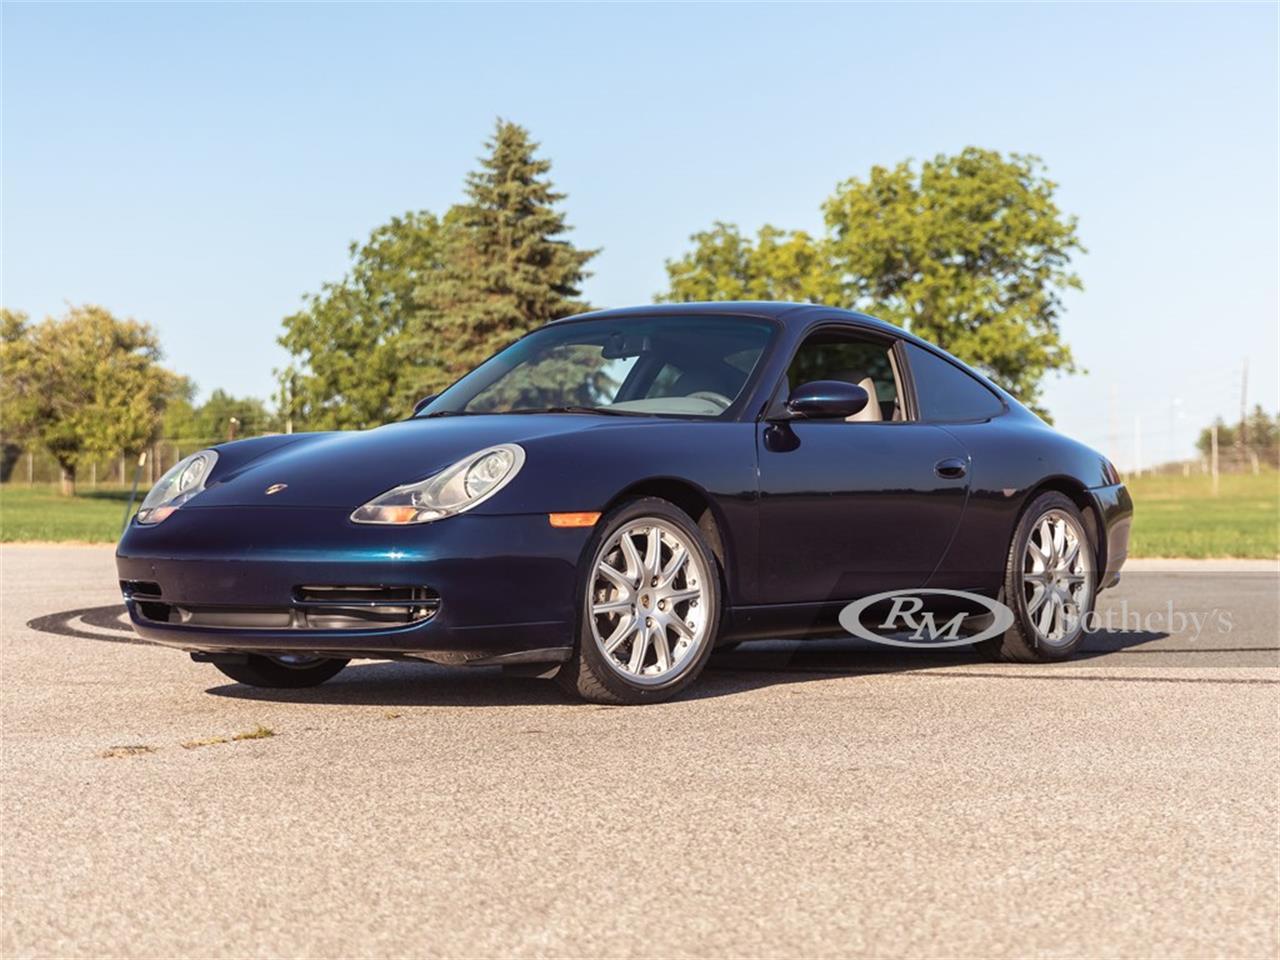 1999 Porsche 911 Carrera (CC-1419164) for sale in Hershey, Pennsylvania